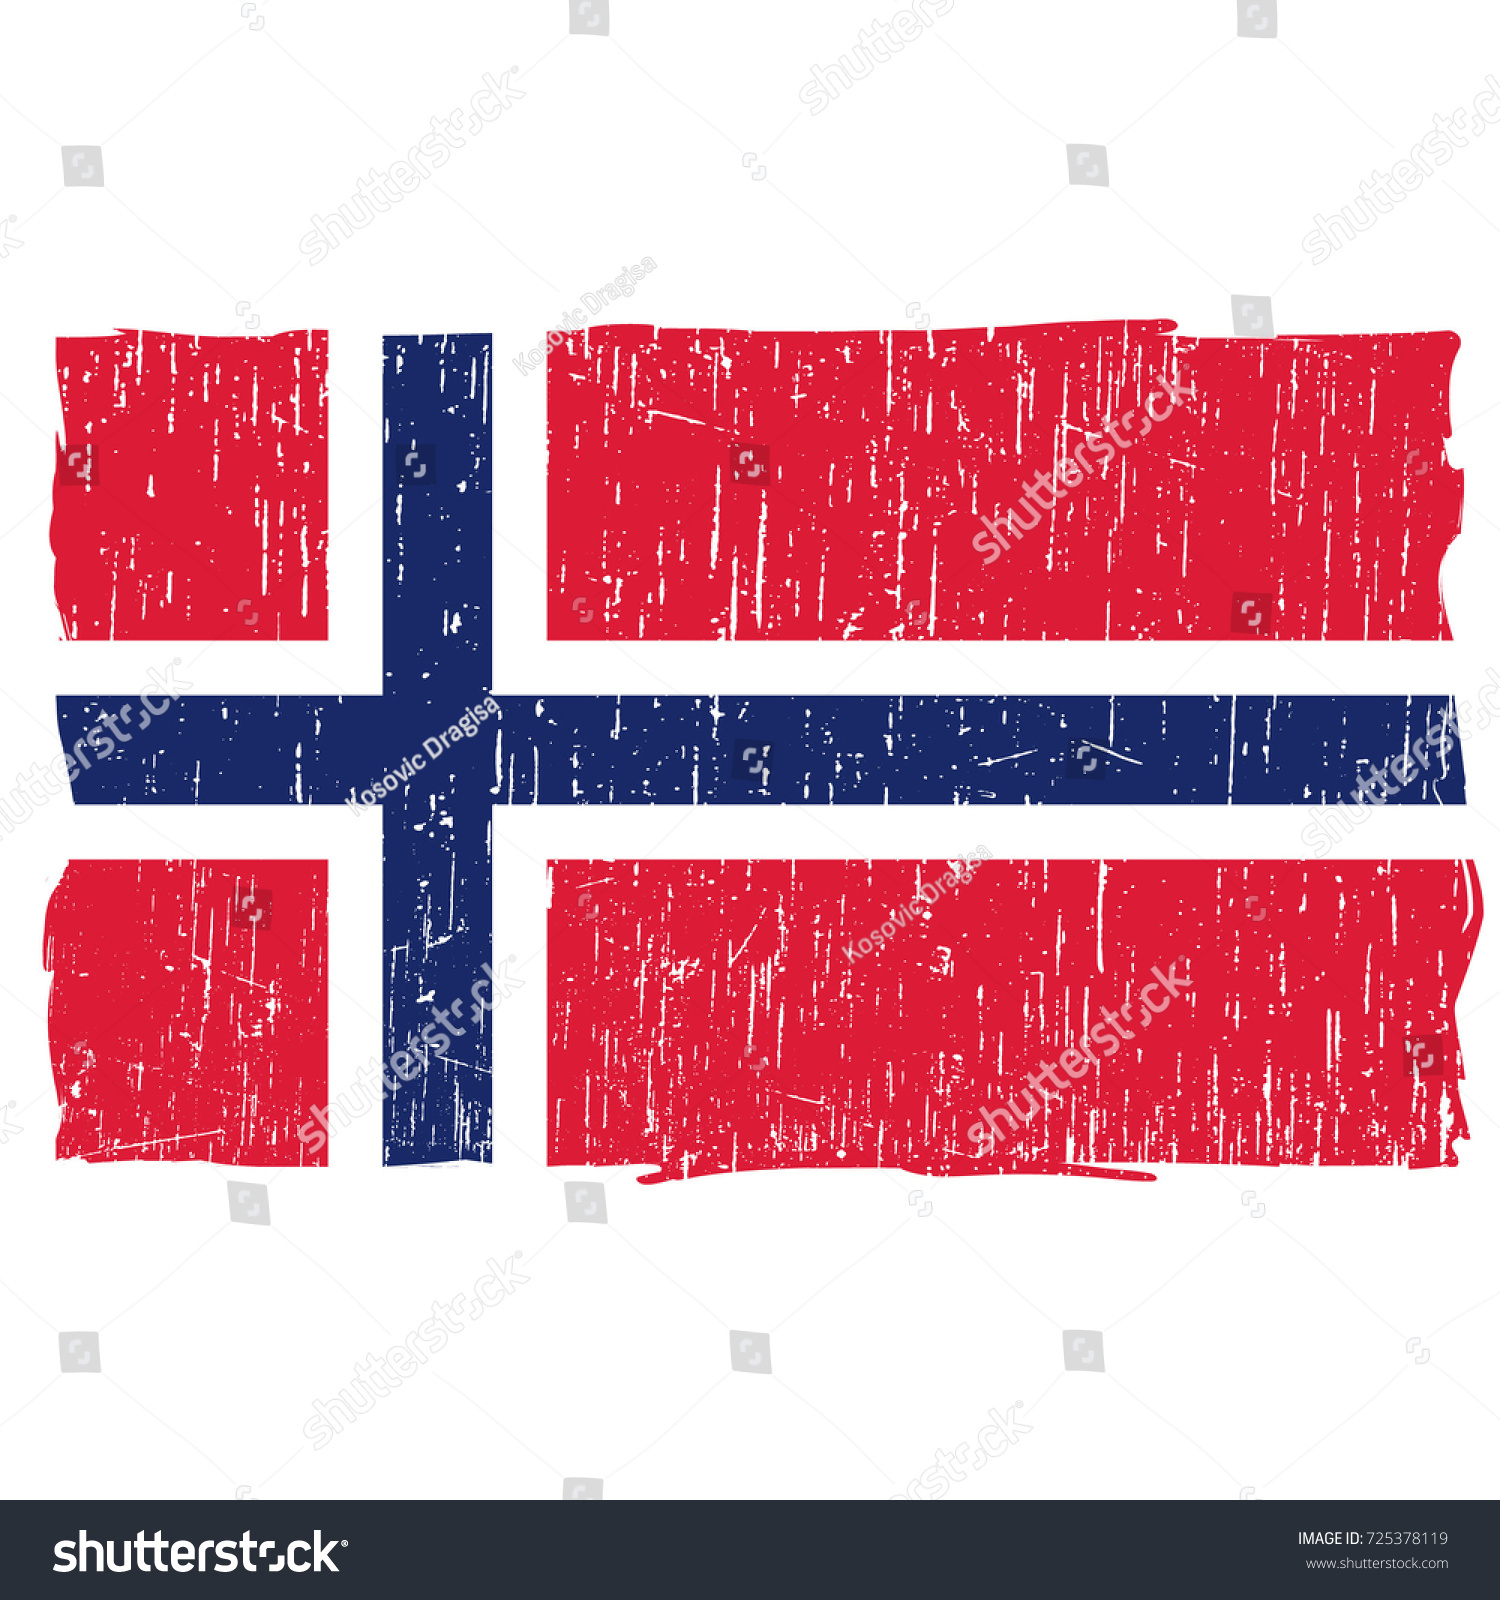 Grunge Norway Flag Vector Easy Use Stock Vector 725378119 - Shutterstock